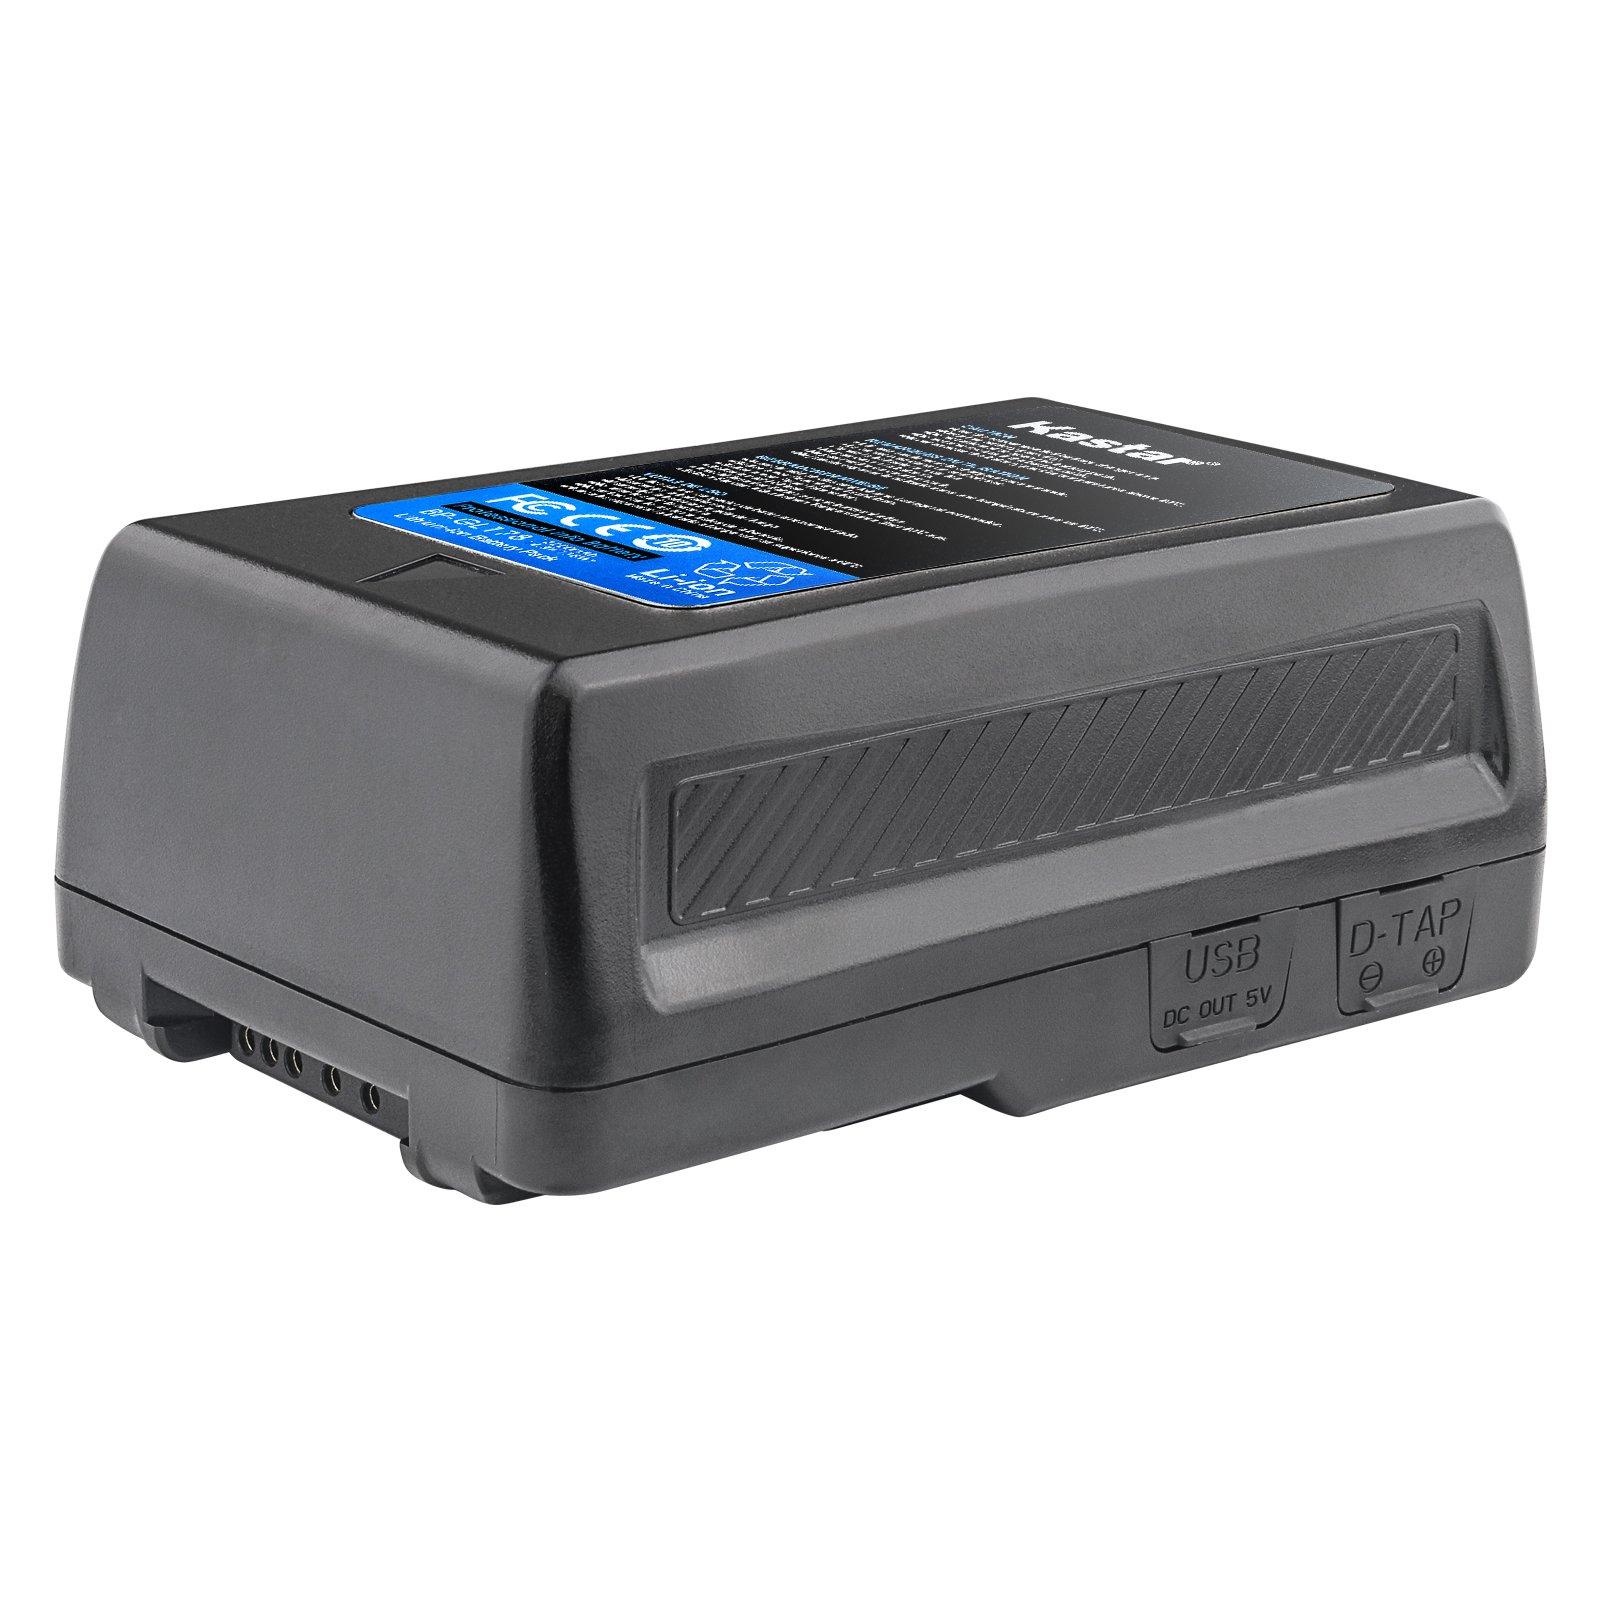 Kastar BP-GL178 Broadcast Replacement V Mount Battery, 14.8V 12000mAh 178Wh for Sony PMW-EX330K PMW-EX330L PMW-580K PMW580L PDW-680 PDW-700 PDW-850 PMW-TD300 HDW-F900R HDW-680 HDW-800P PMW-F55 PMW-F5 by Kastar (Image #3)